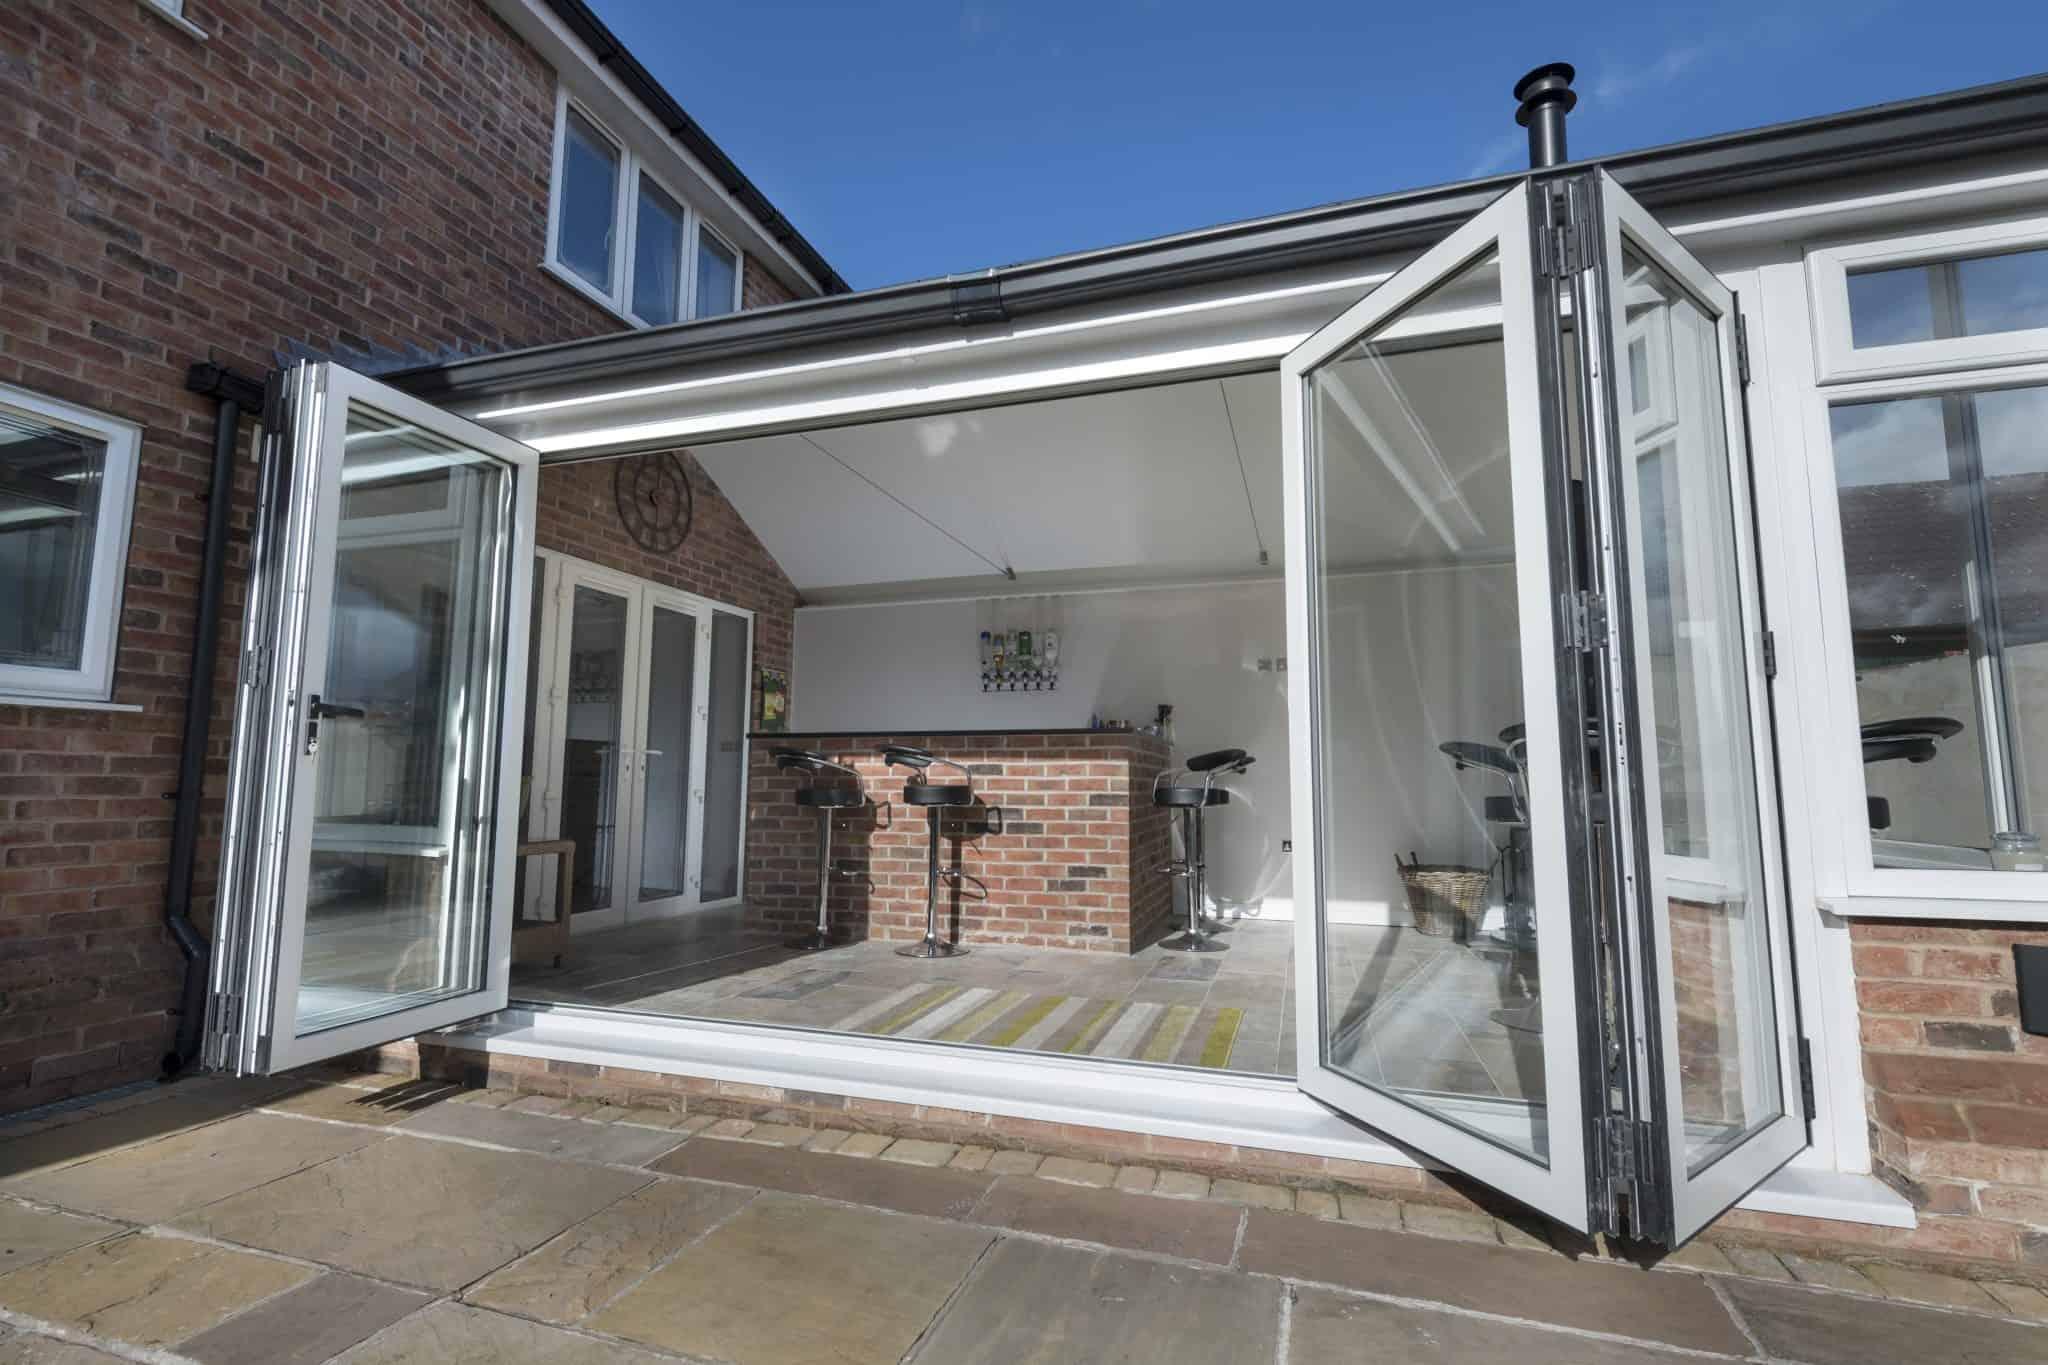 bi-fold doors on extension